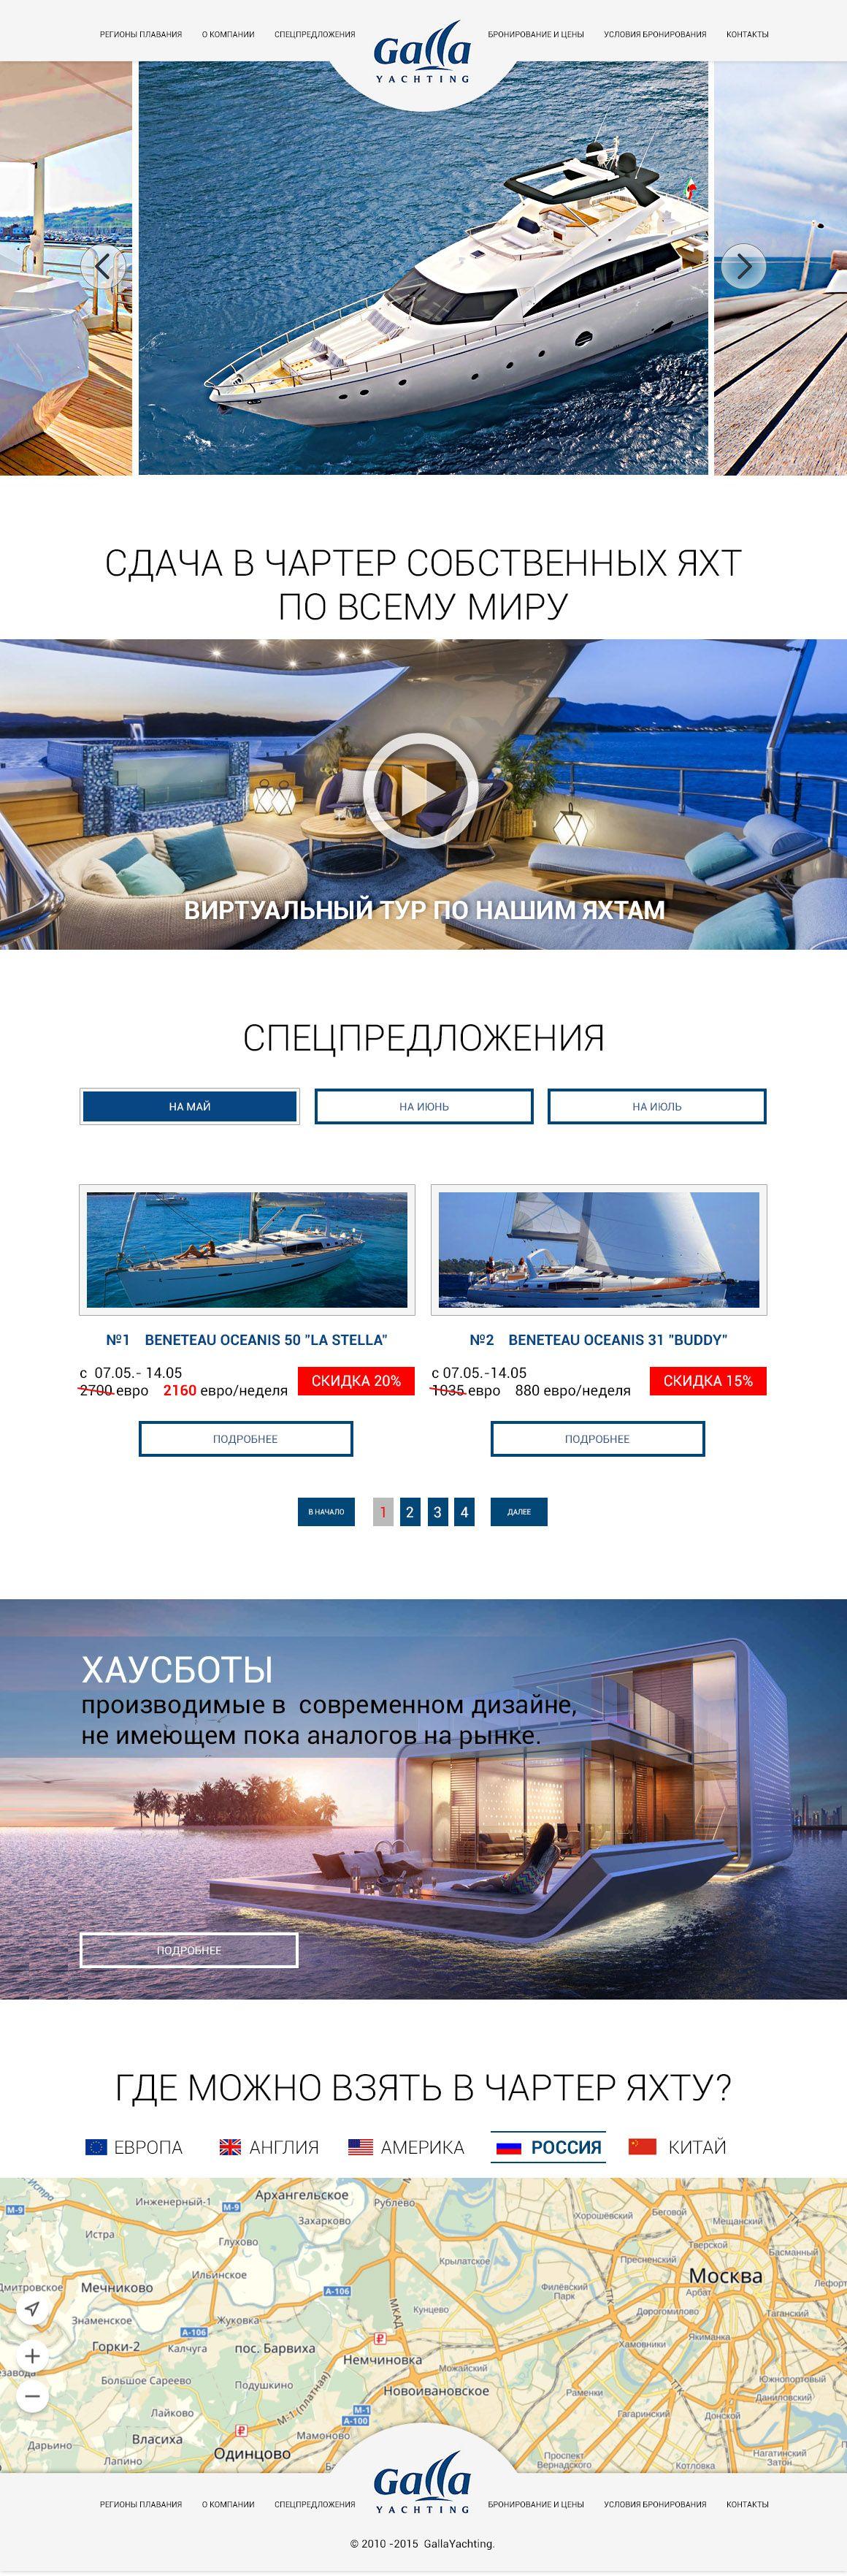 Веб-сайт для gallayachting.com - дизайнер futuro-desing